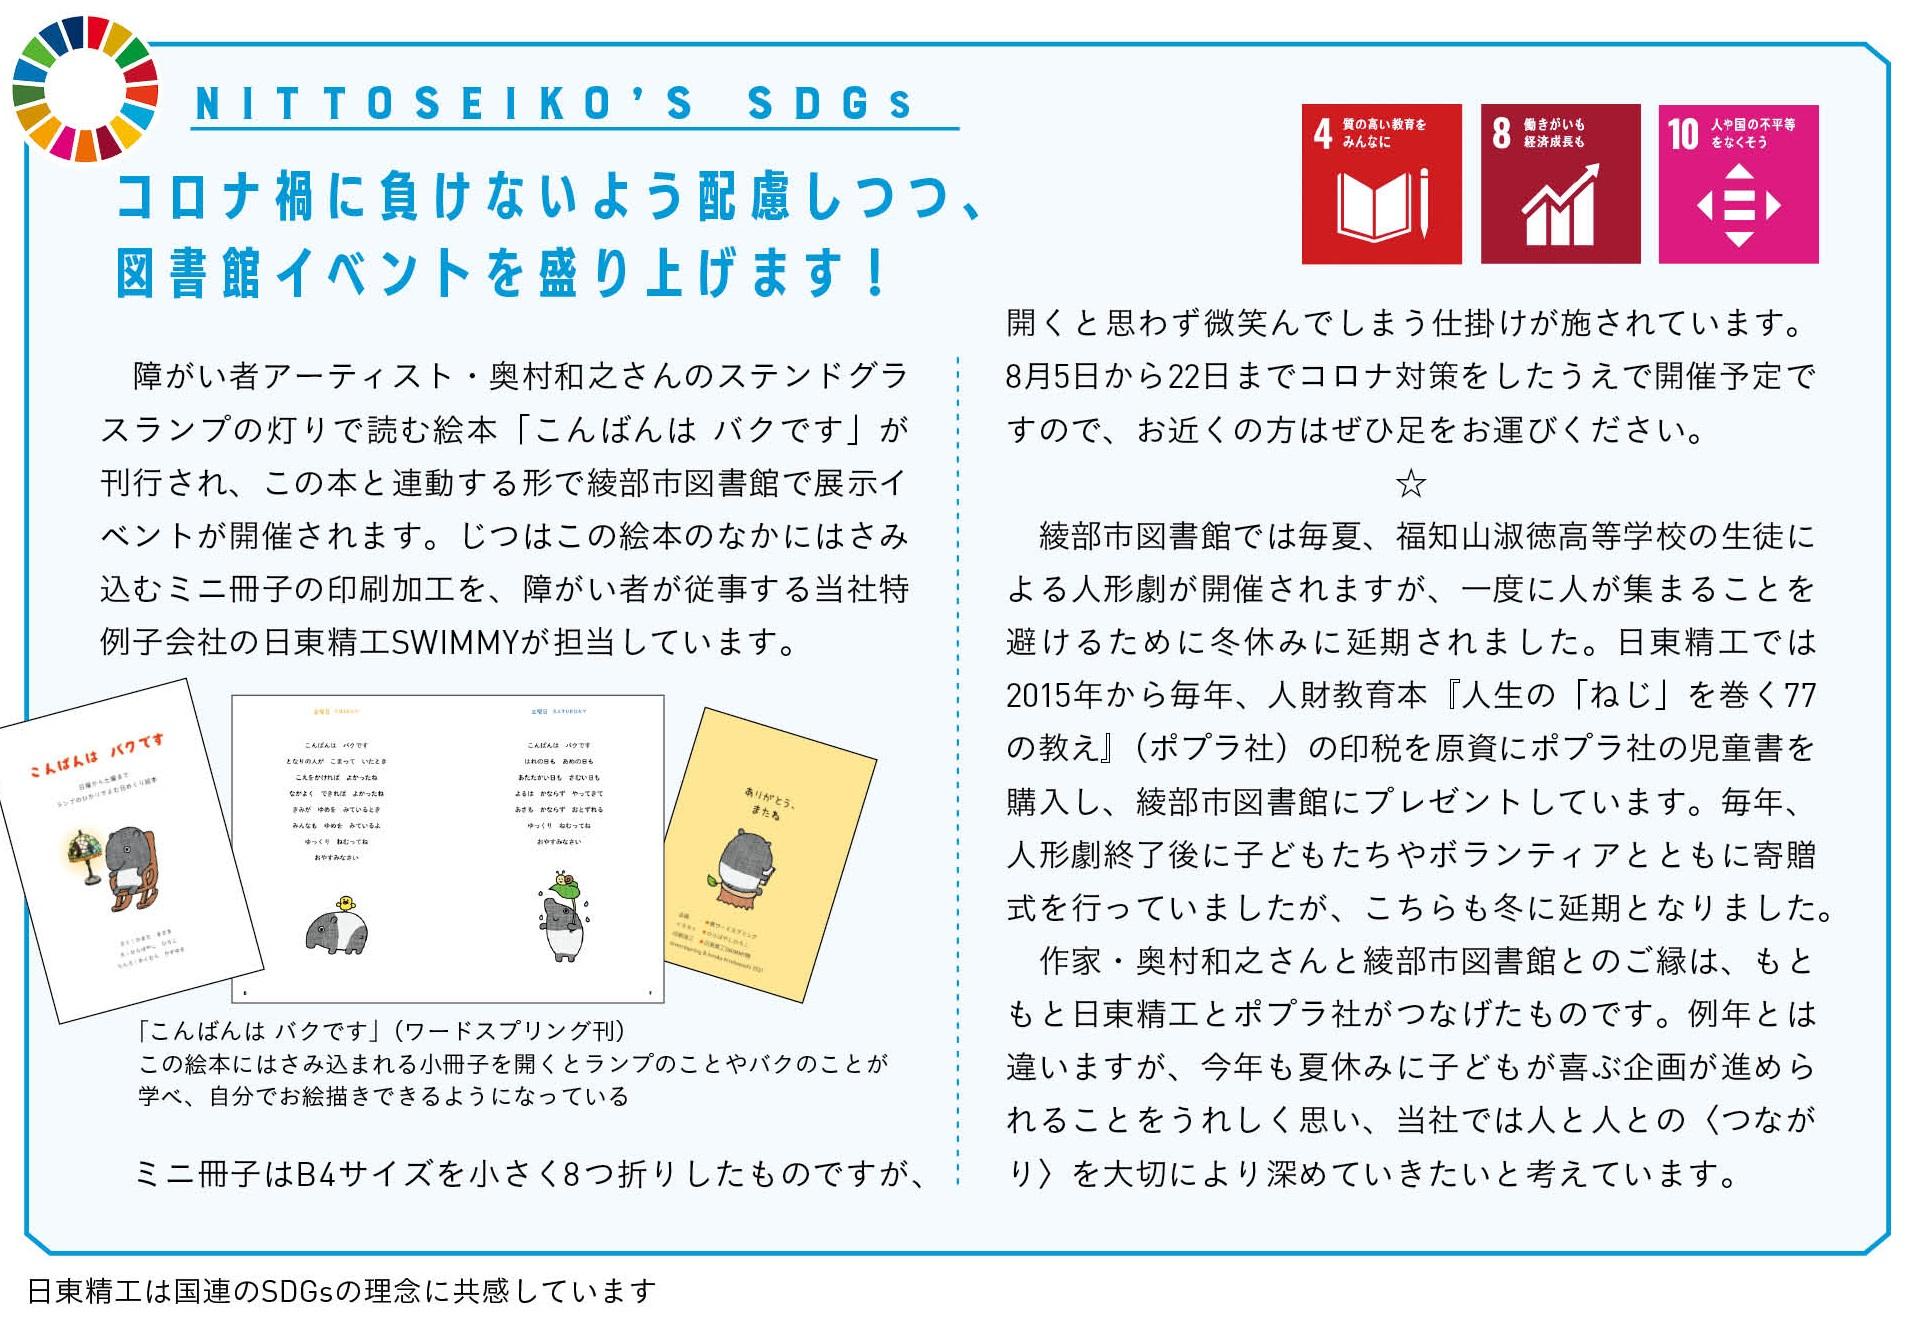 SDGs(図書館イベント)